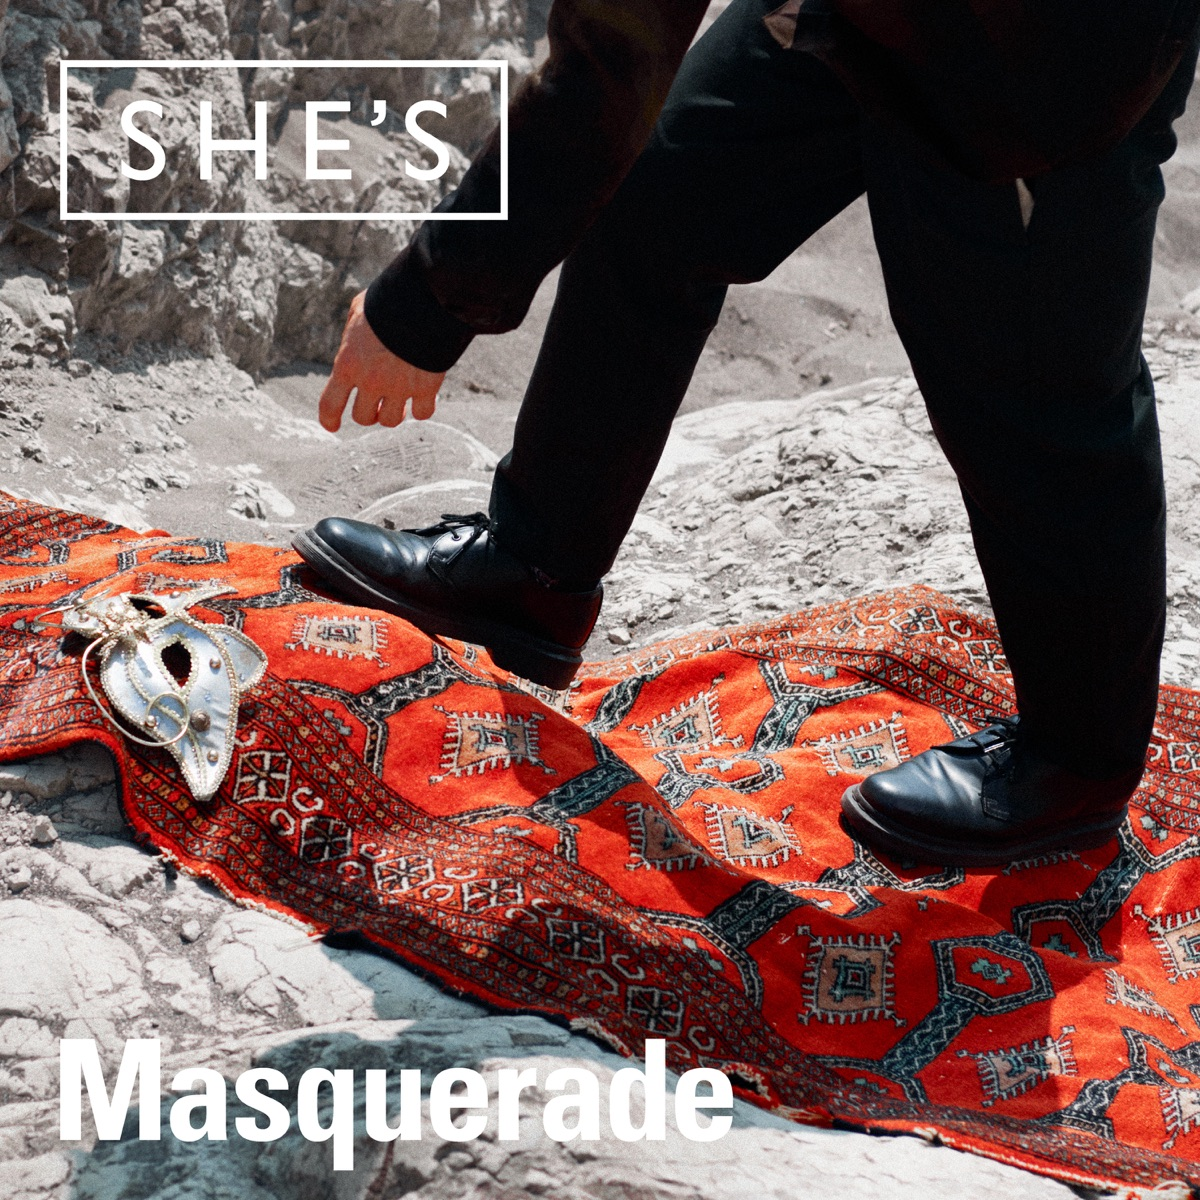 『SHE'S - Masquerade』収録の『Masquerade』ジャケット